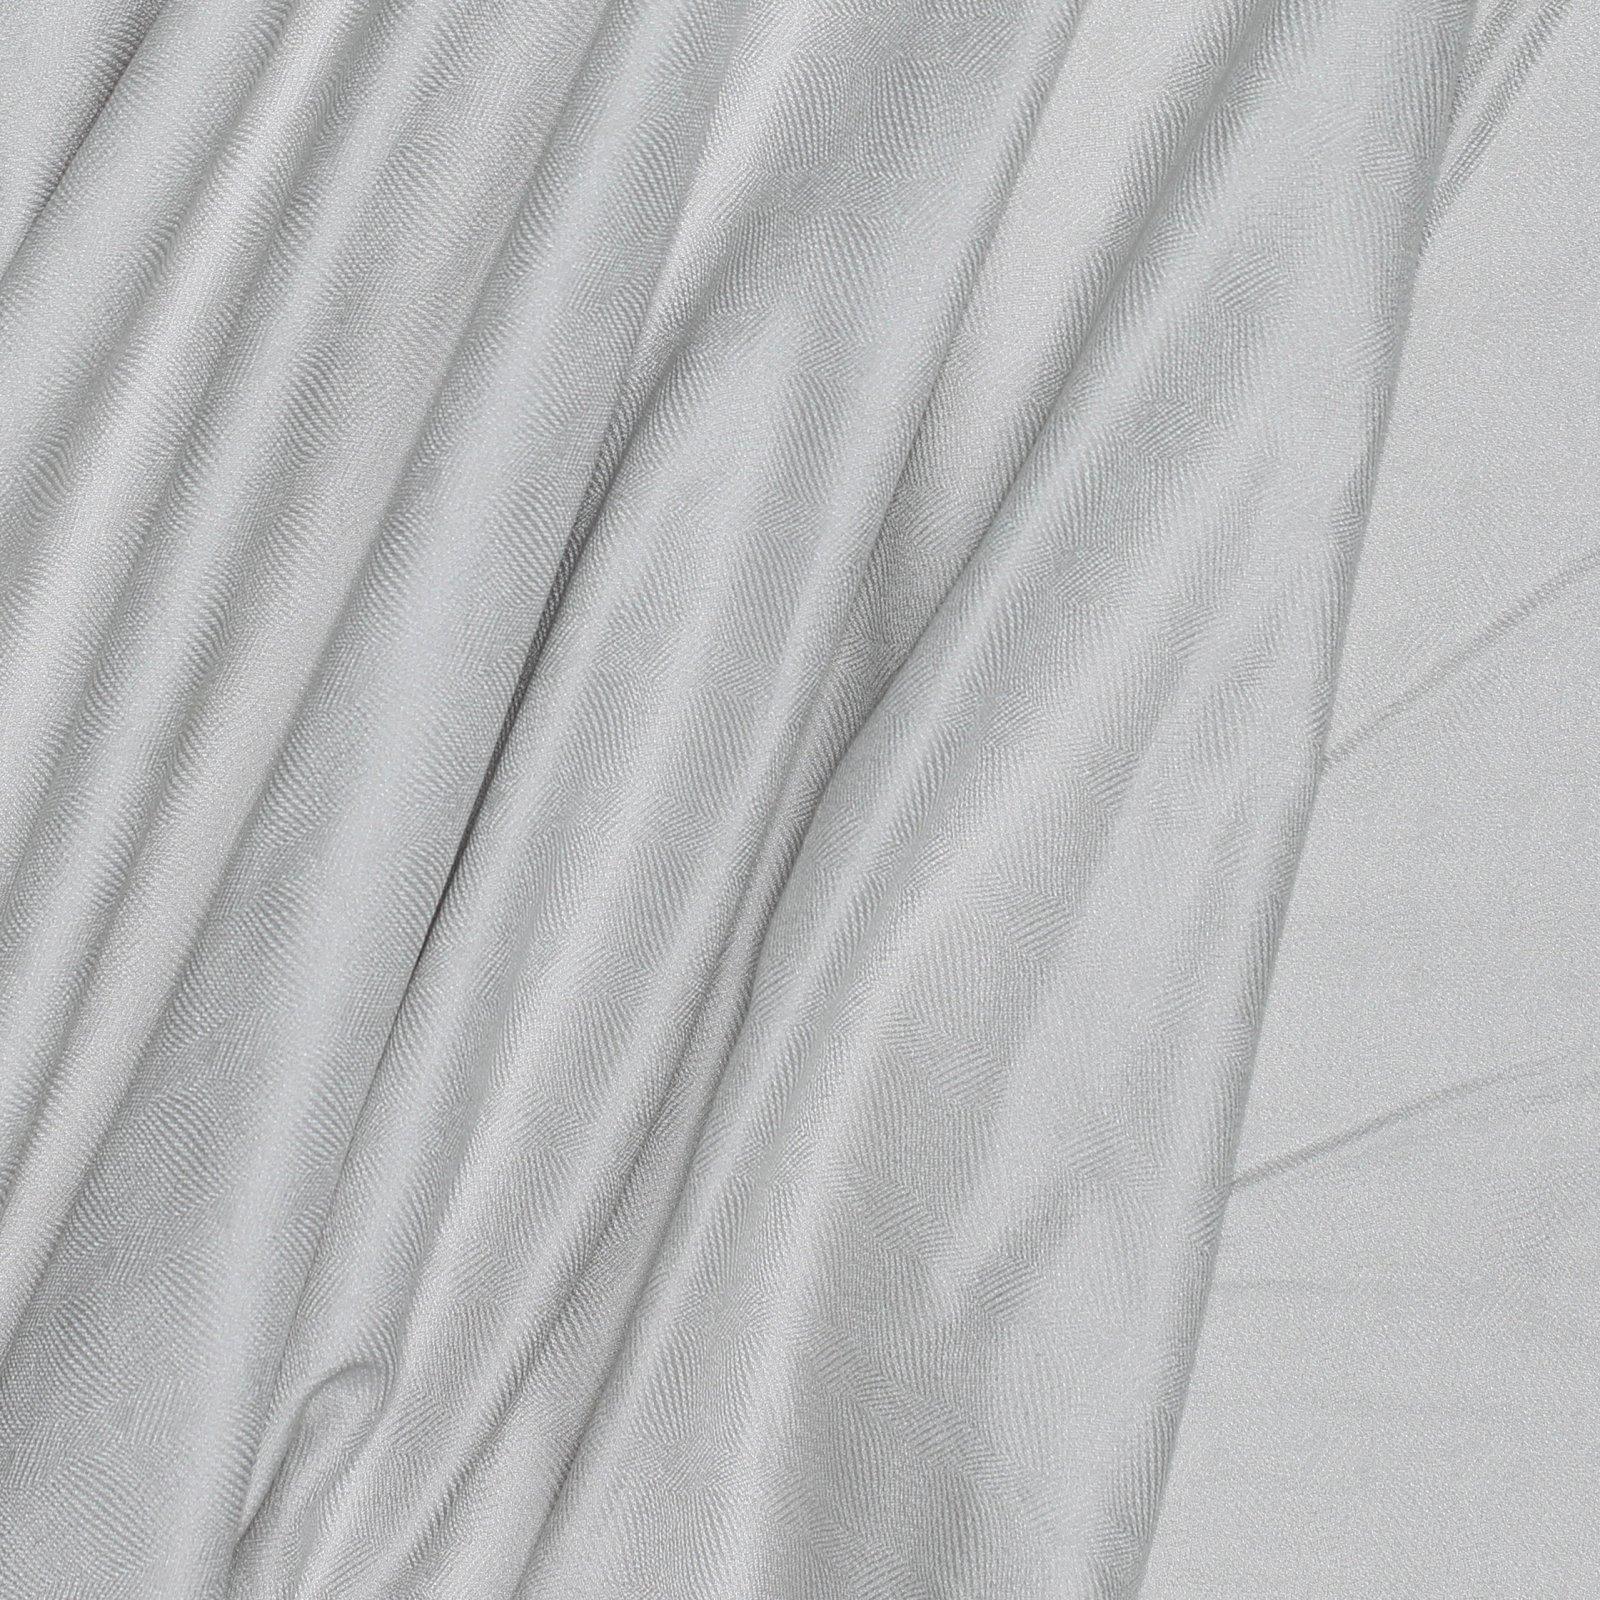 Ecru  w/ Optical Illusion Jacquard Italian Cotton/Rayon Blend